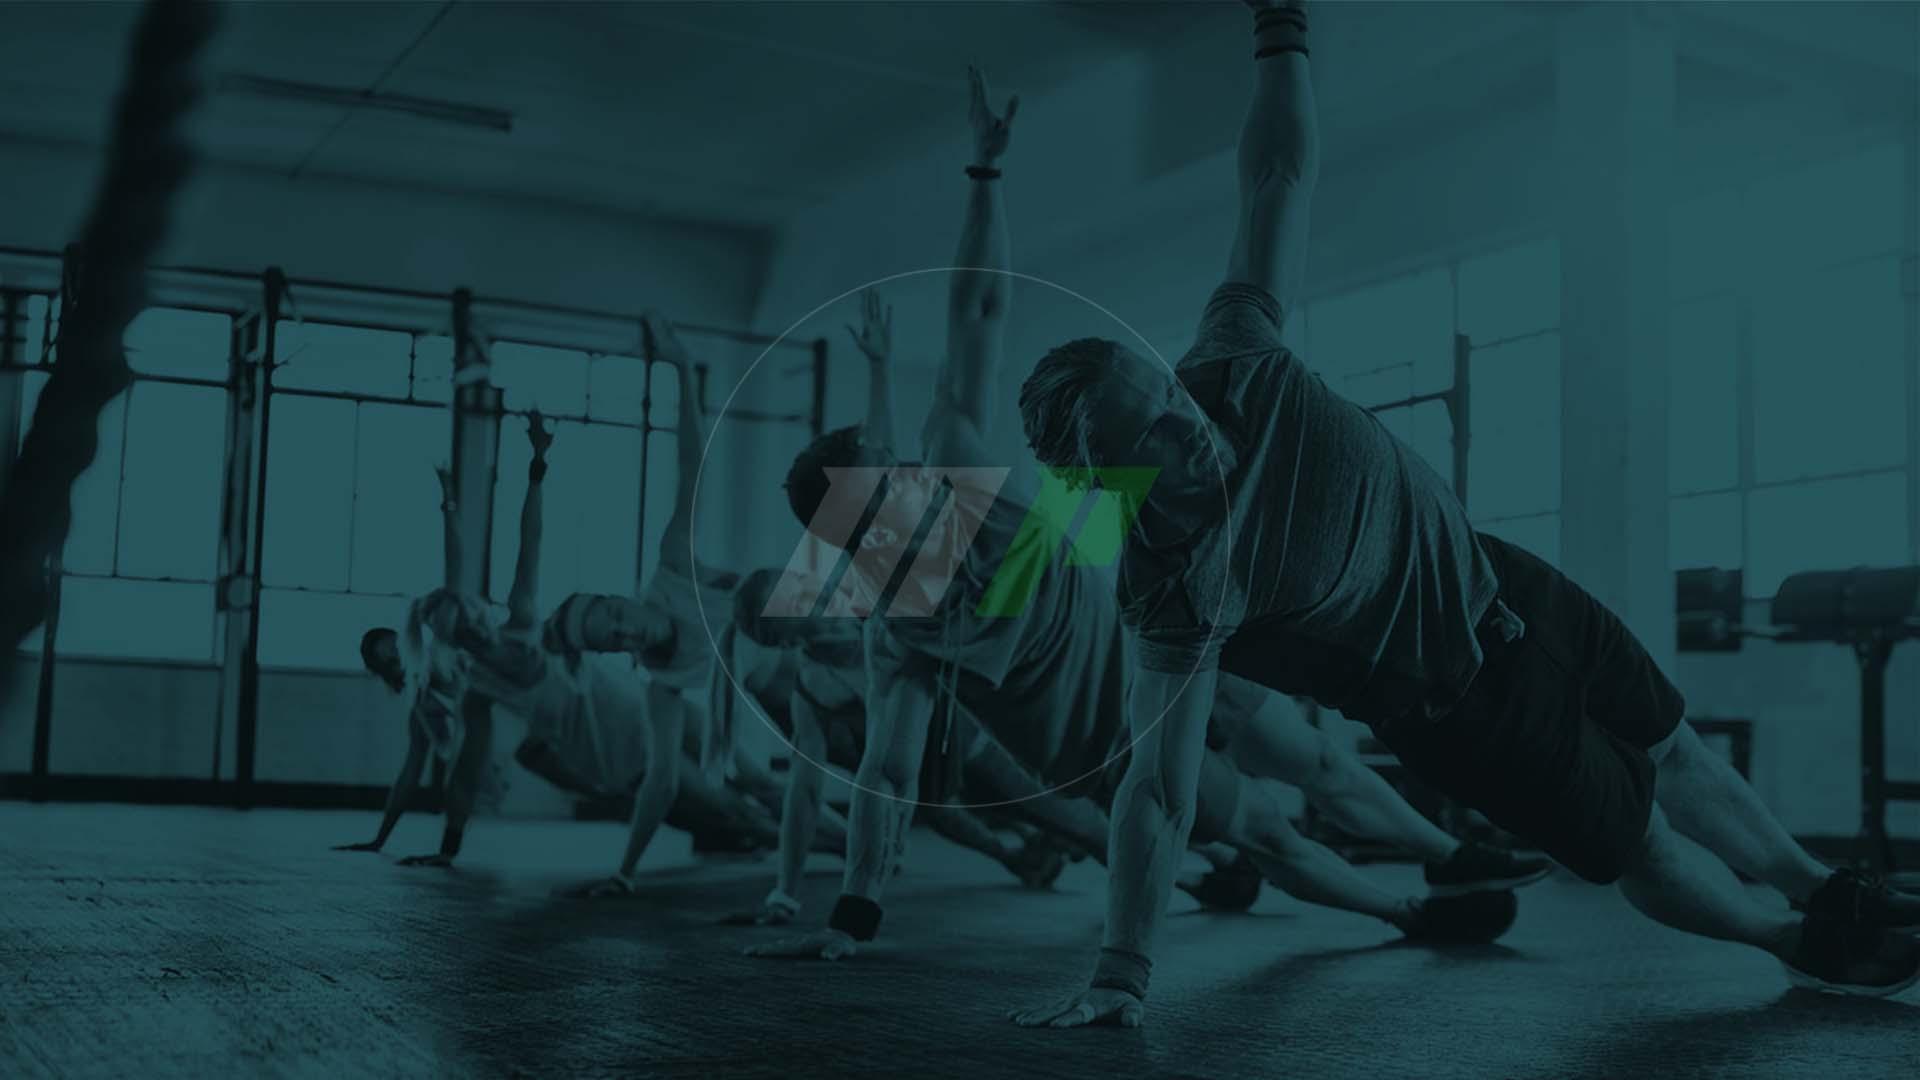 MP Group Exercise Trainer ® seminar banner by MPBalatsinos